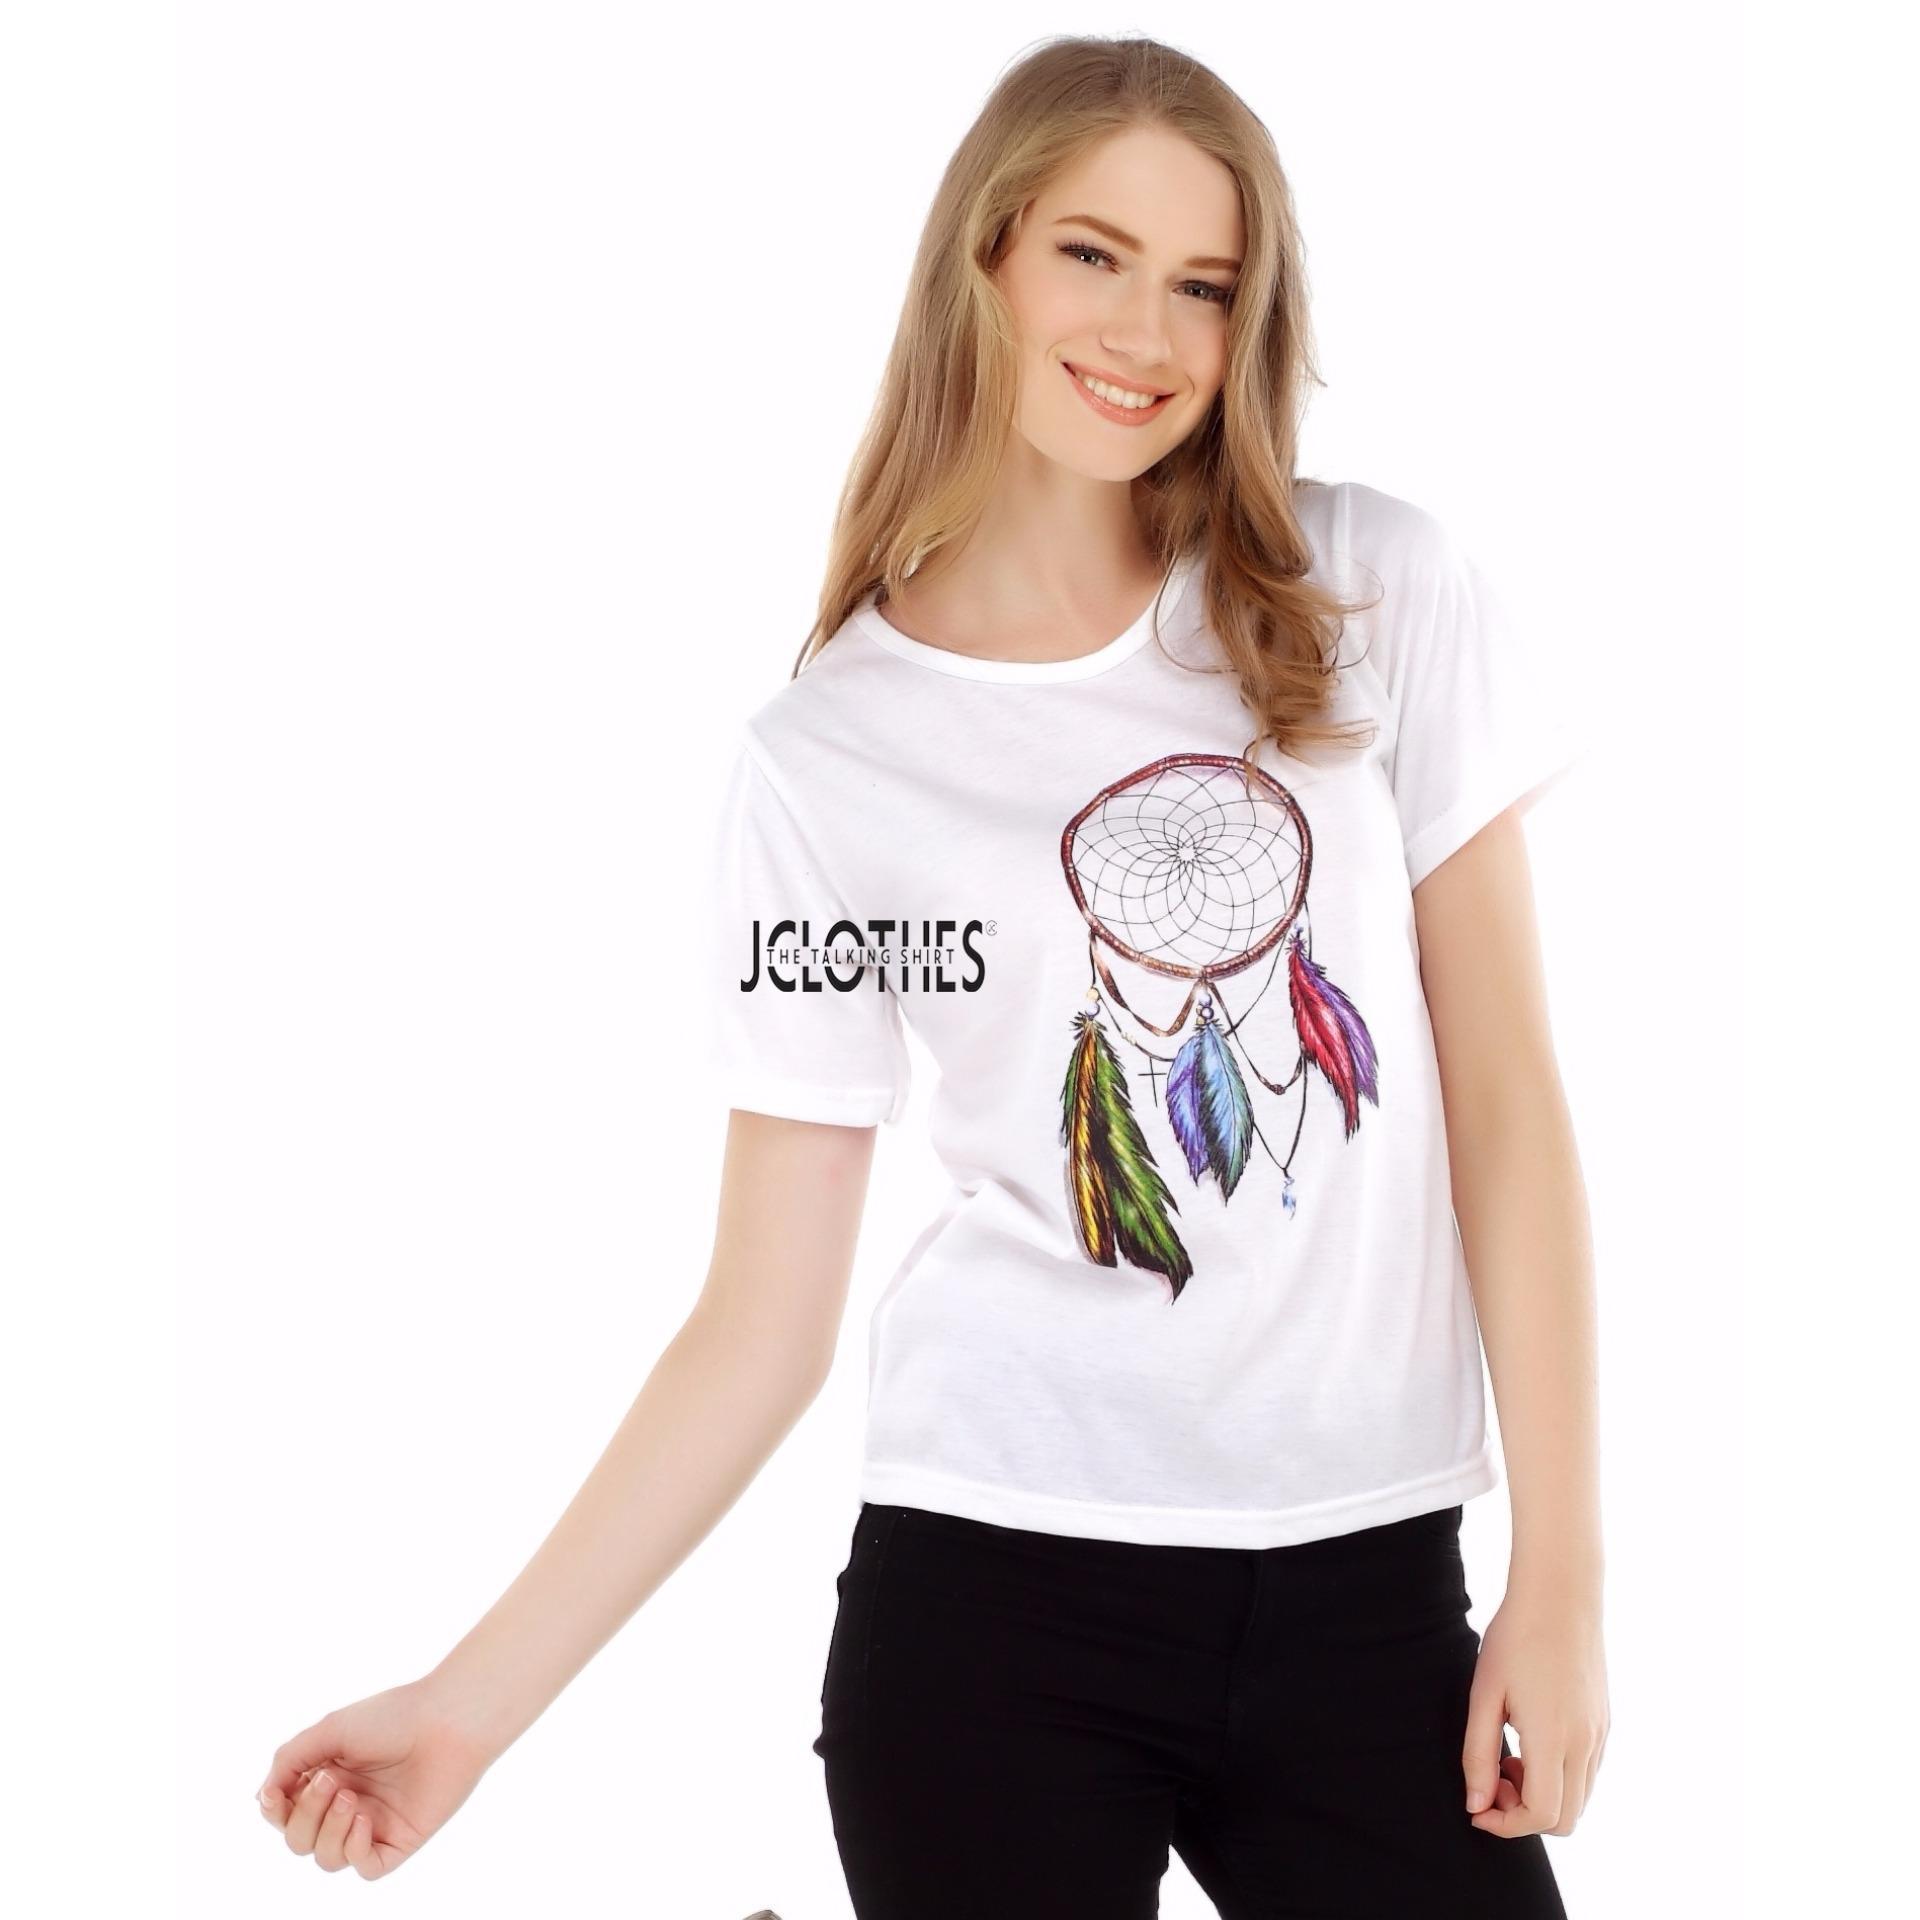 JCLOTHES Kaos Cewe   Tumblr Tee   Kaos Wanita   Baju Cewek Dream Catcher  287e818598